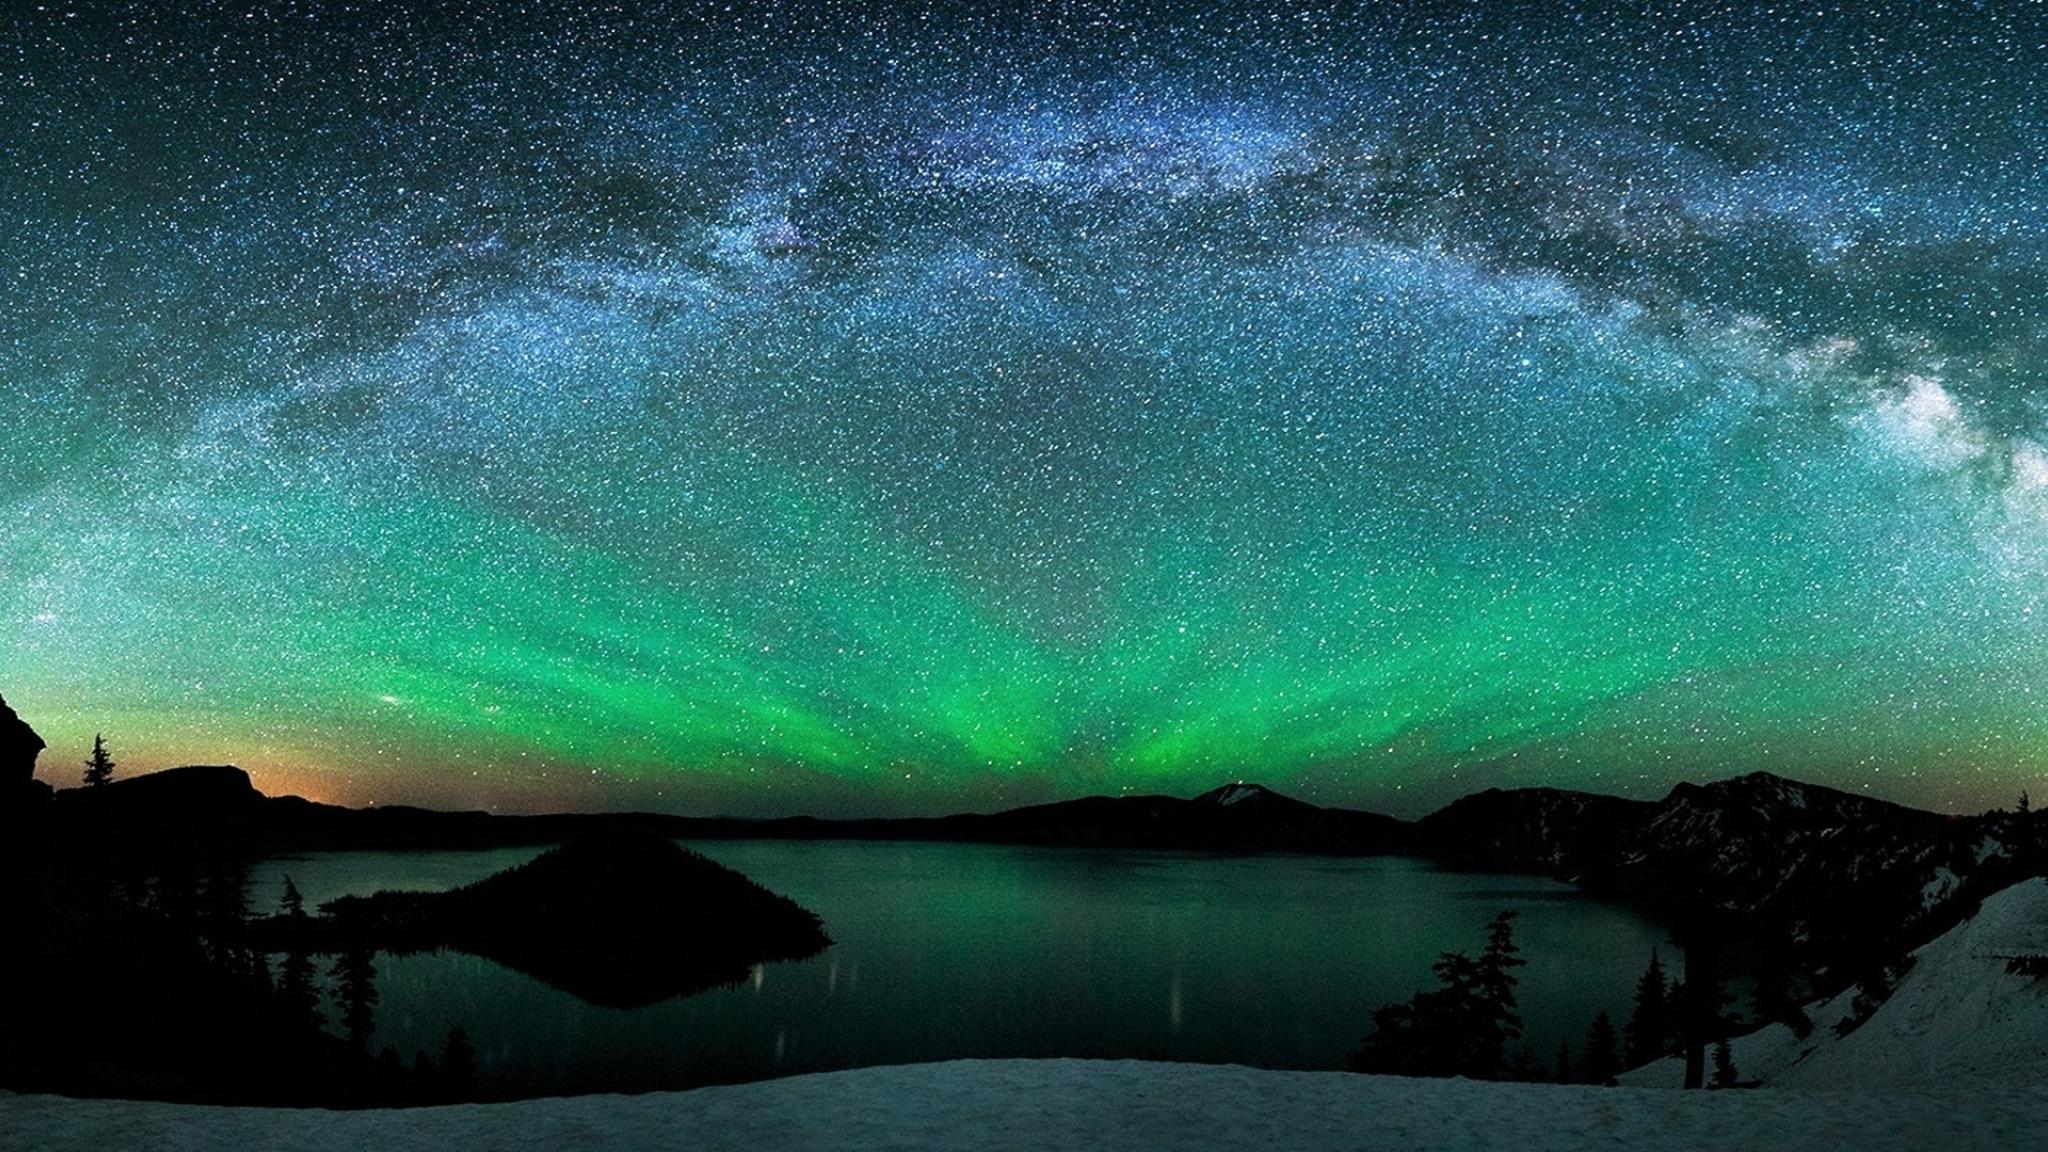 Aurora Borealis Over Winter Lake Full Hd 2k Wallpaper